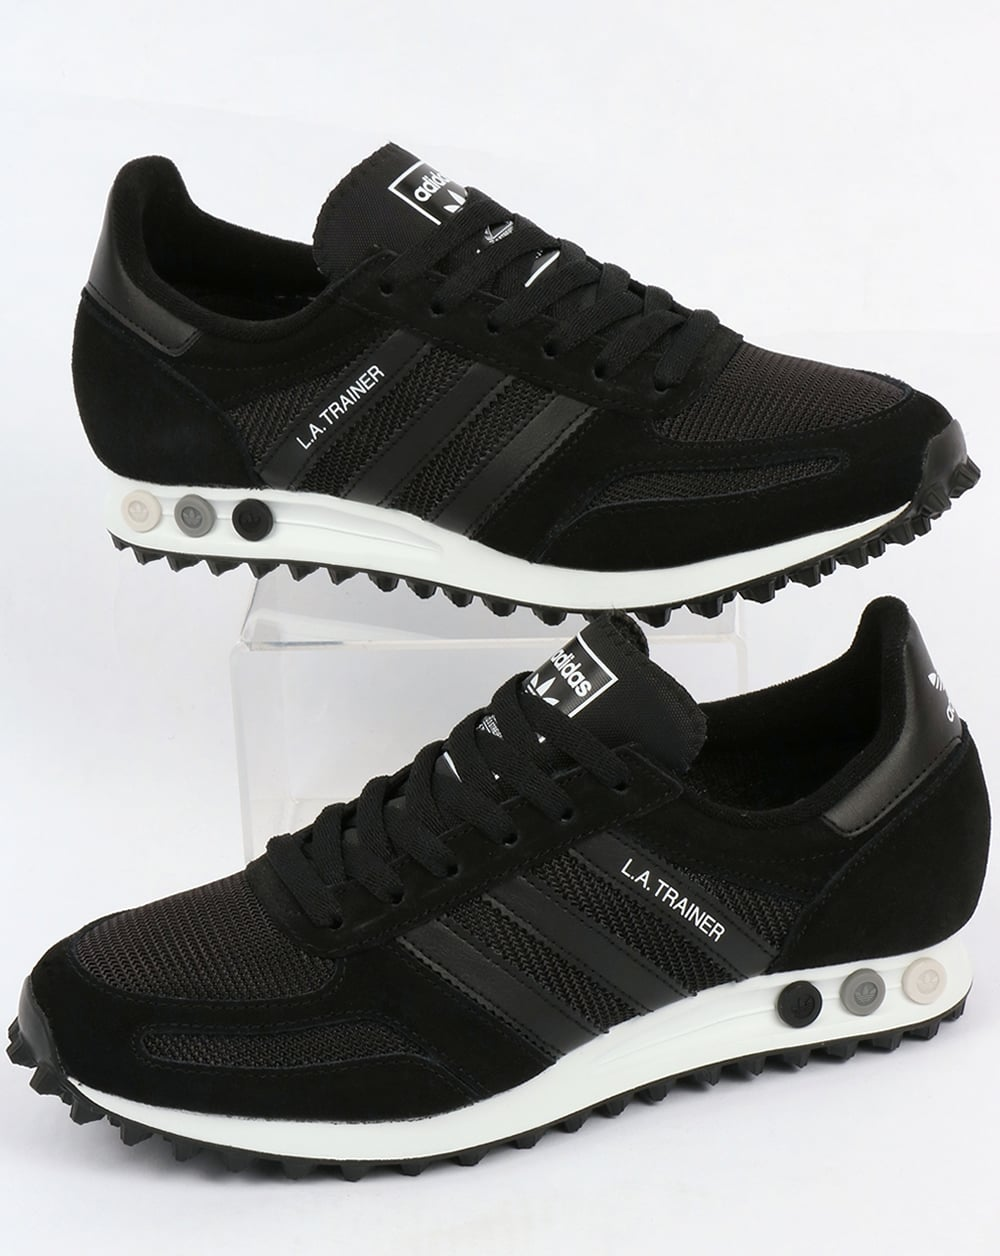 huge selection of 7f414 e4341 adidas Trainers Adidas LA Trainer OG Black